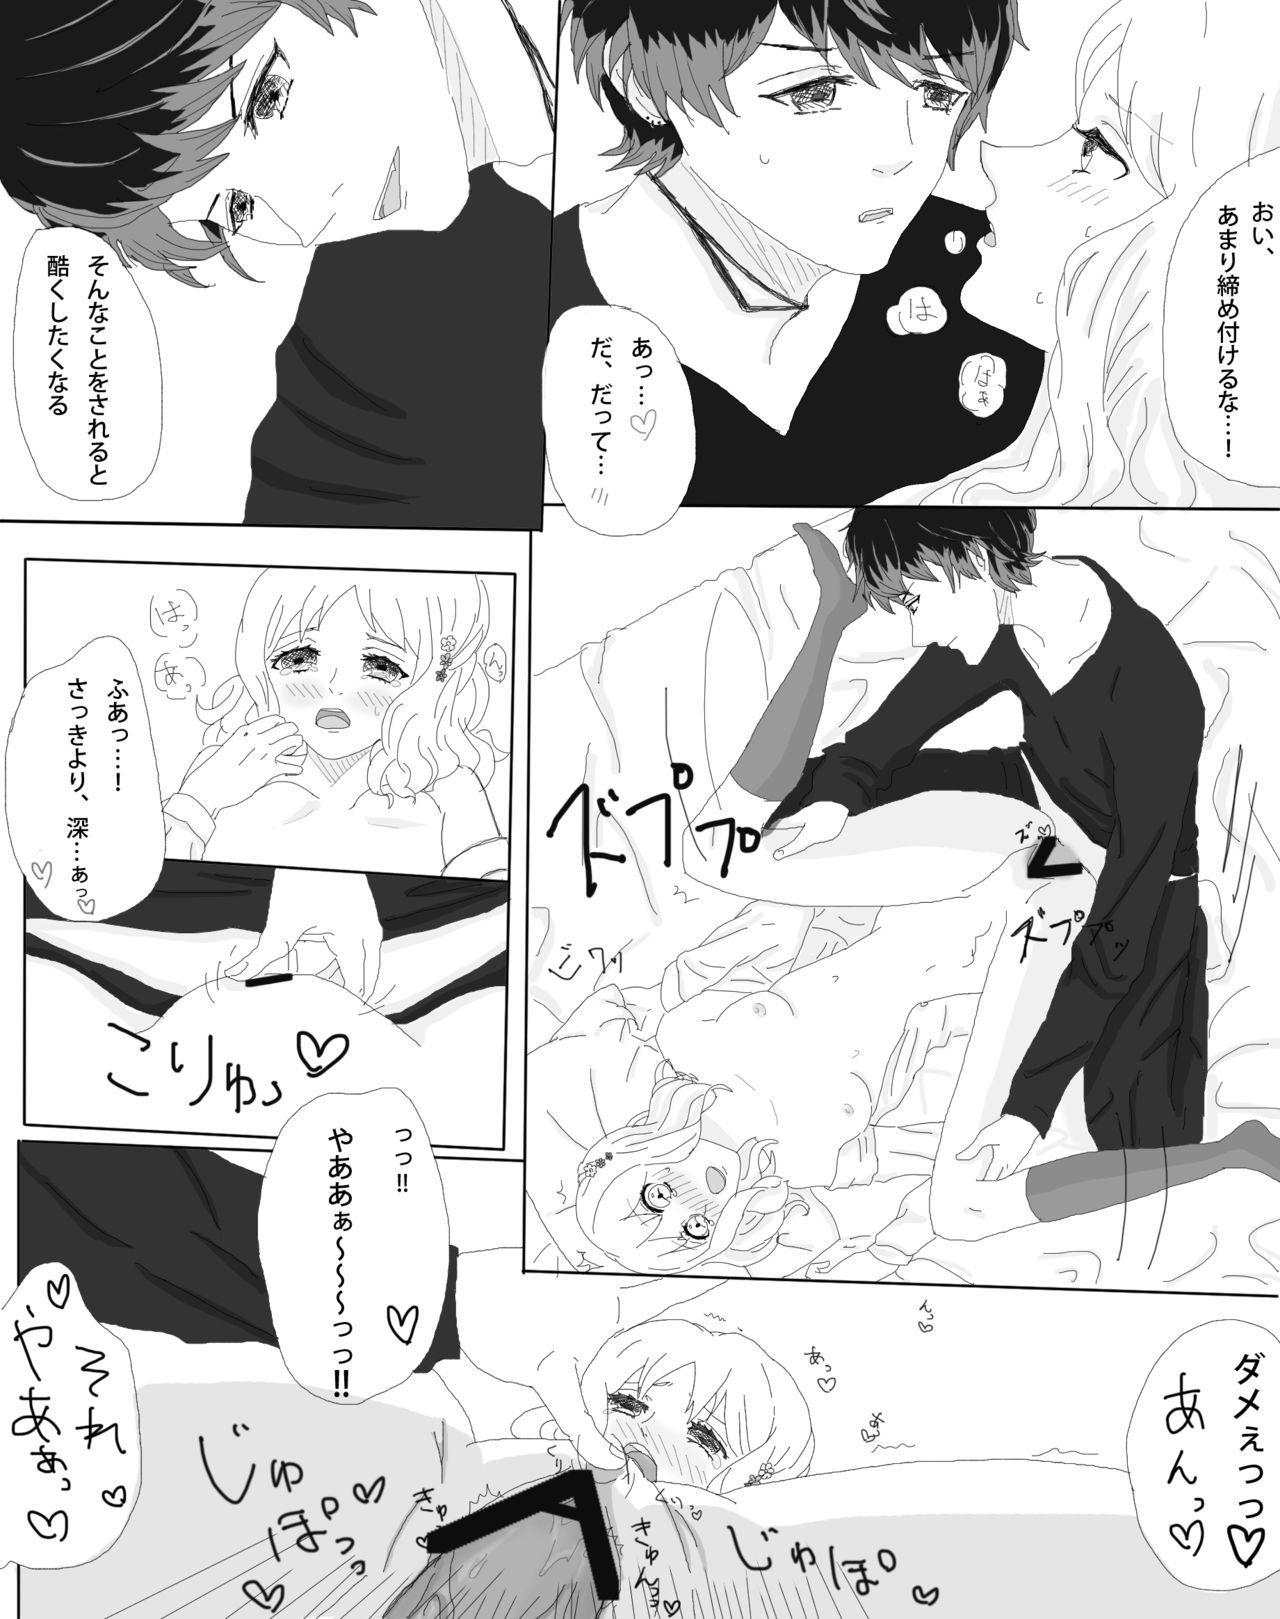 Rukiyui-chan no wo Midarana Manga 3